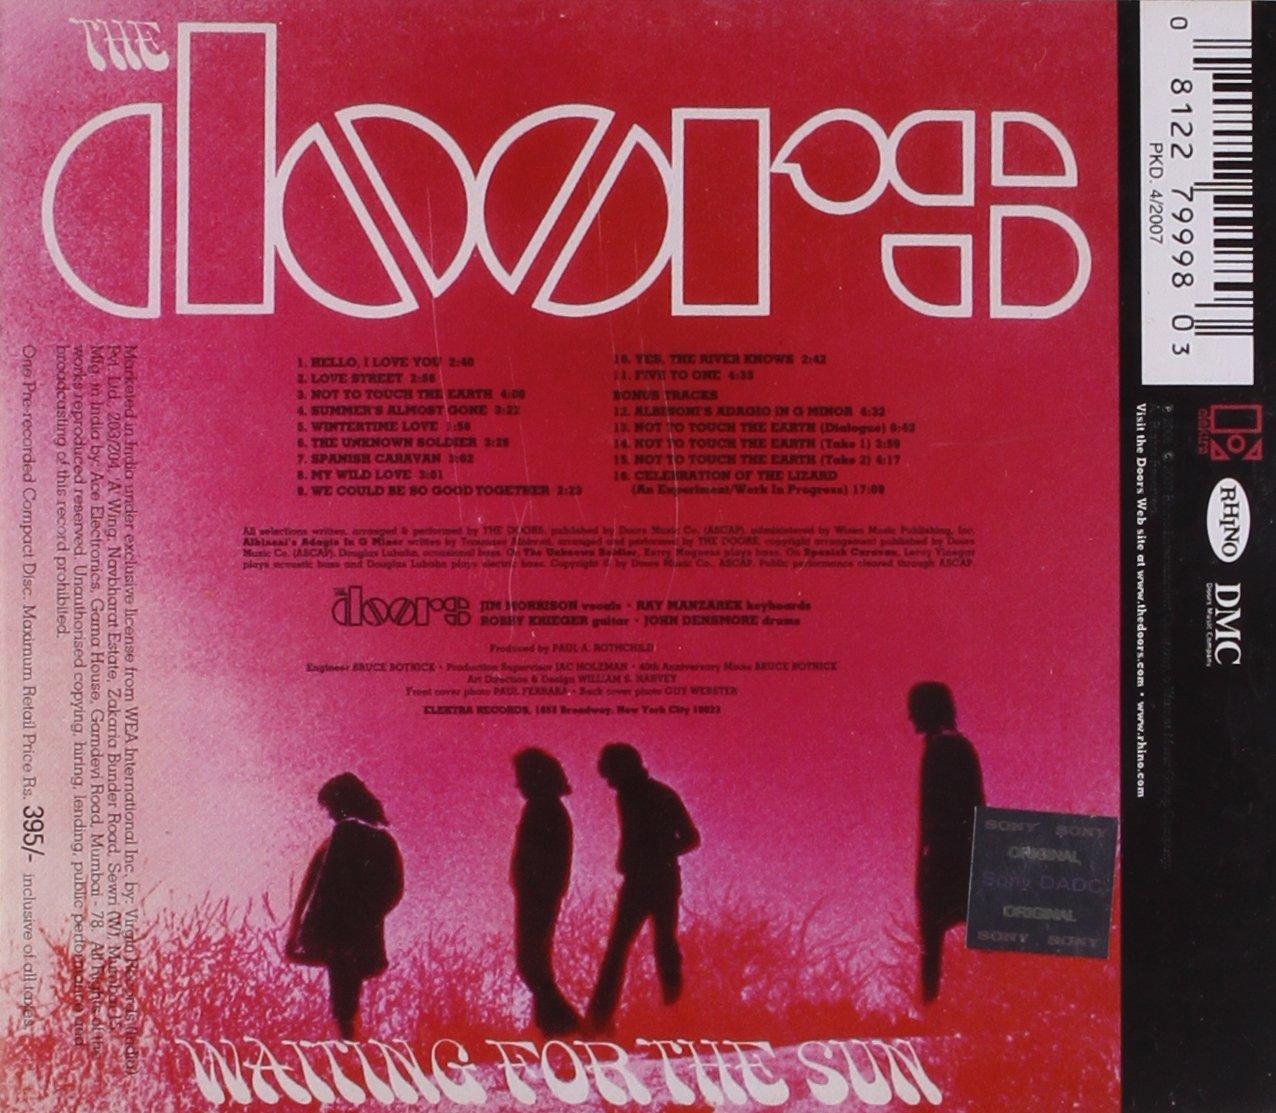 & Doors - Waiting for the Sun (40th Anniversary Mix) - Amazon.com Music